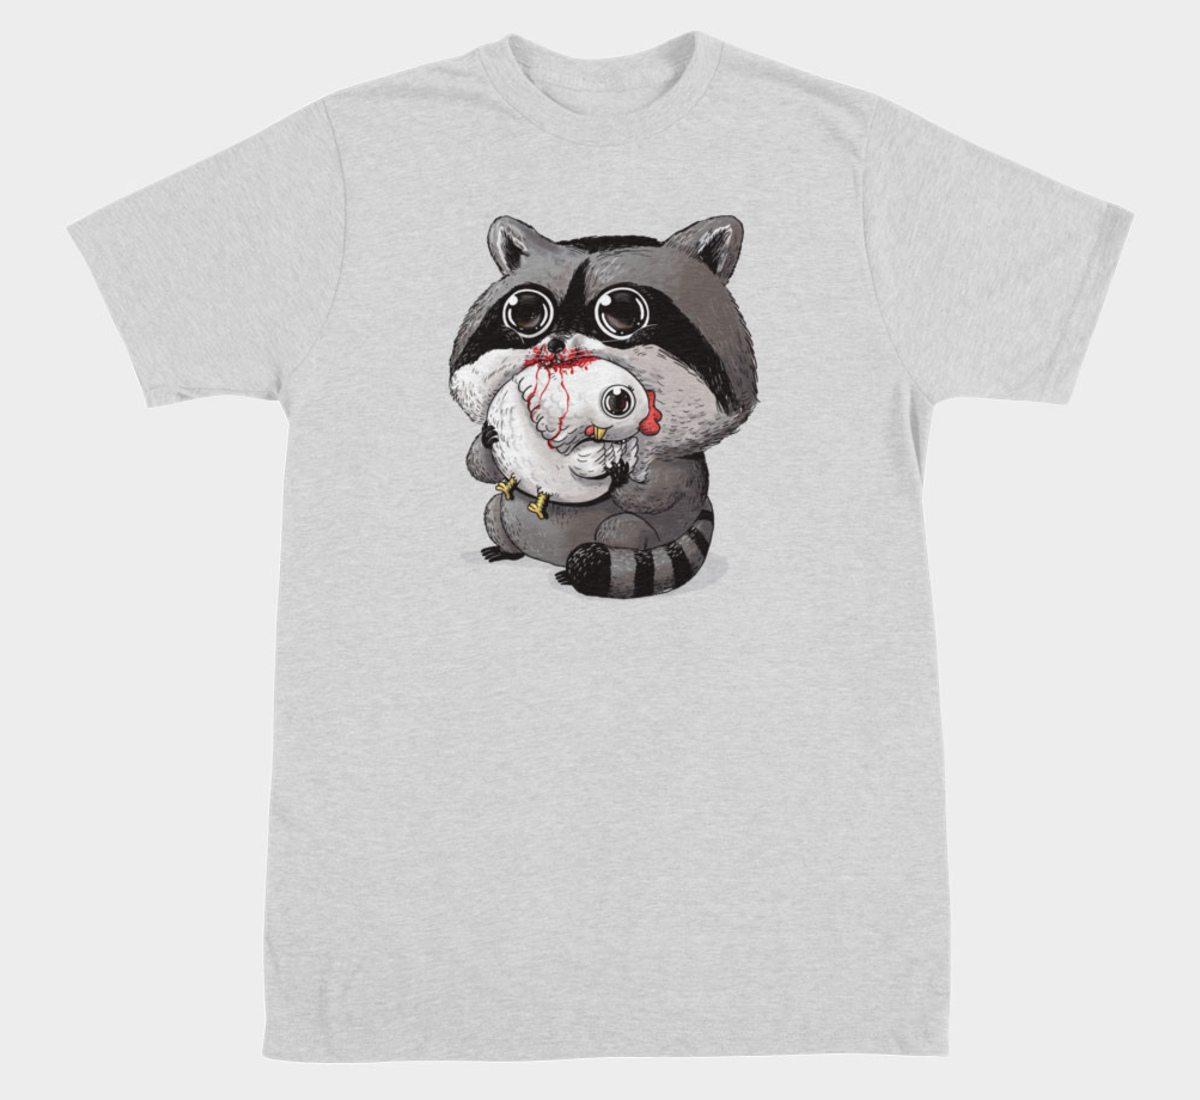 shirt_guys_01racoon2